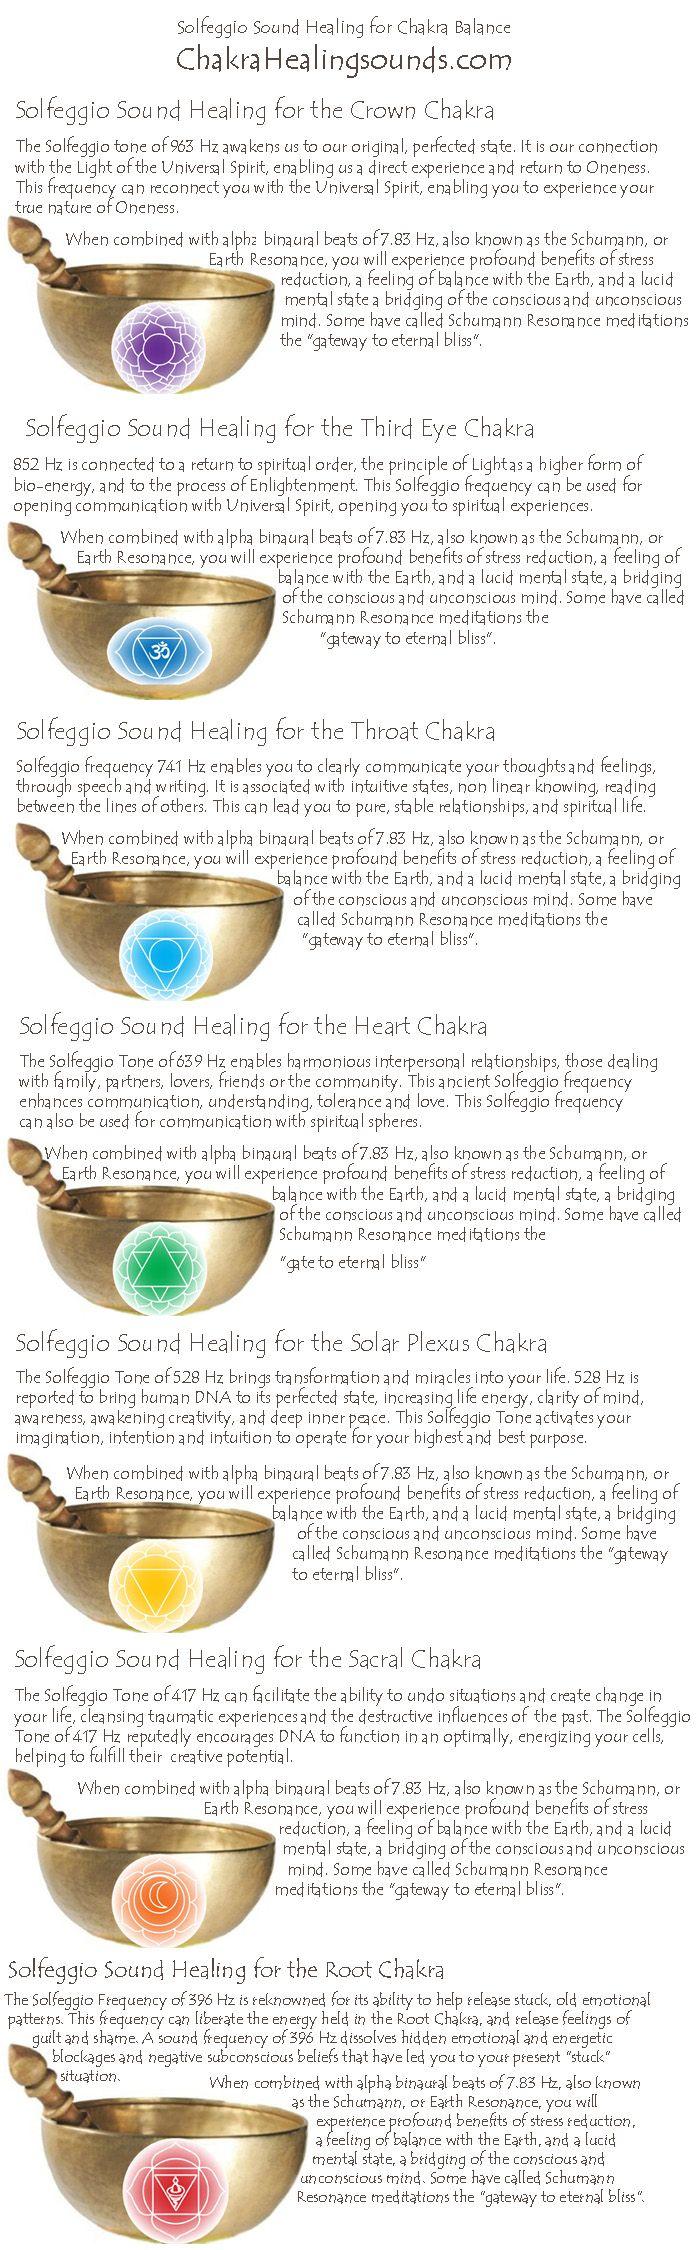 Tibetan Singing Bowl Solfeggio Frequencies For Chakra Balancing And Meditation Visit Our Website To Download Chakra Healin Chakra Chakra Healing Reiki Symbols